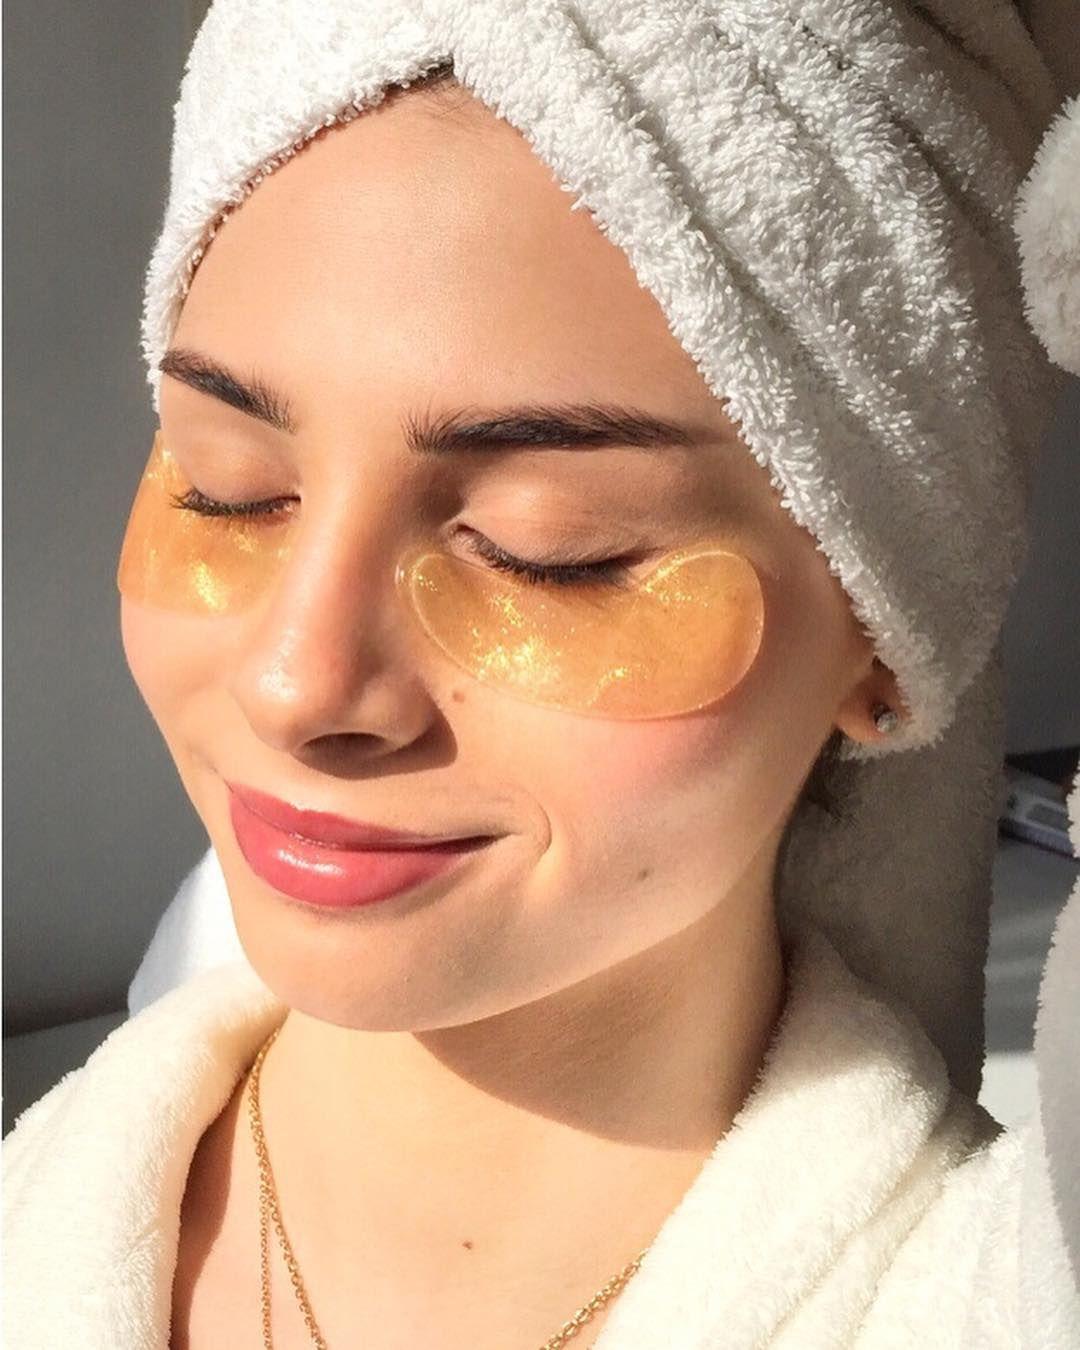 Enjoy Sunshine With Swanstareyemask Goldeyemask Eyemask Swanstar Collageneyemask Under Eye Mask Beauty Beauty Hacks